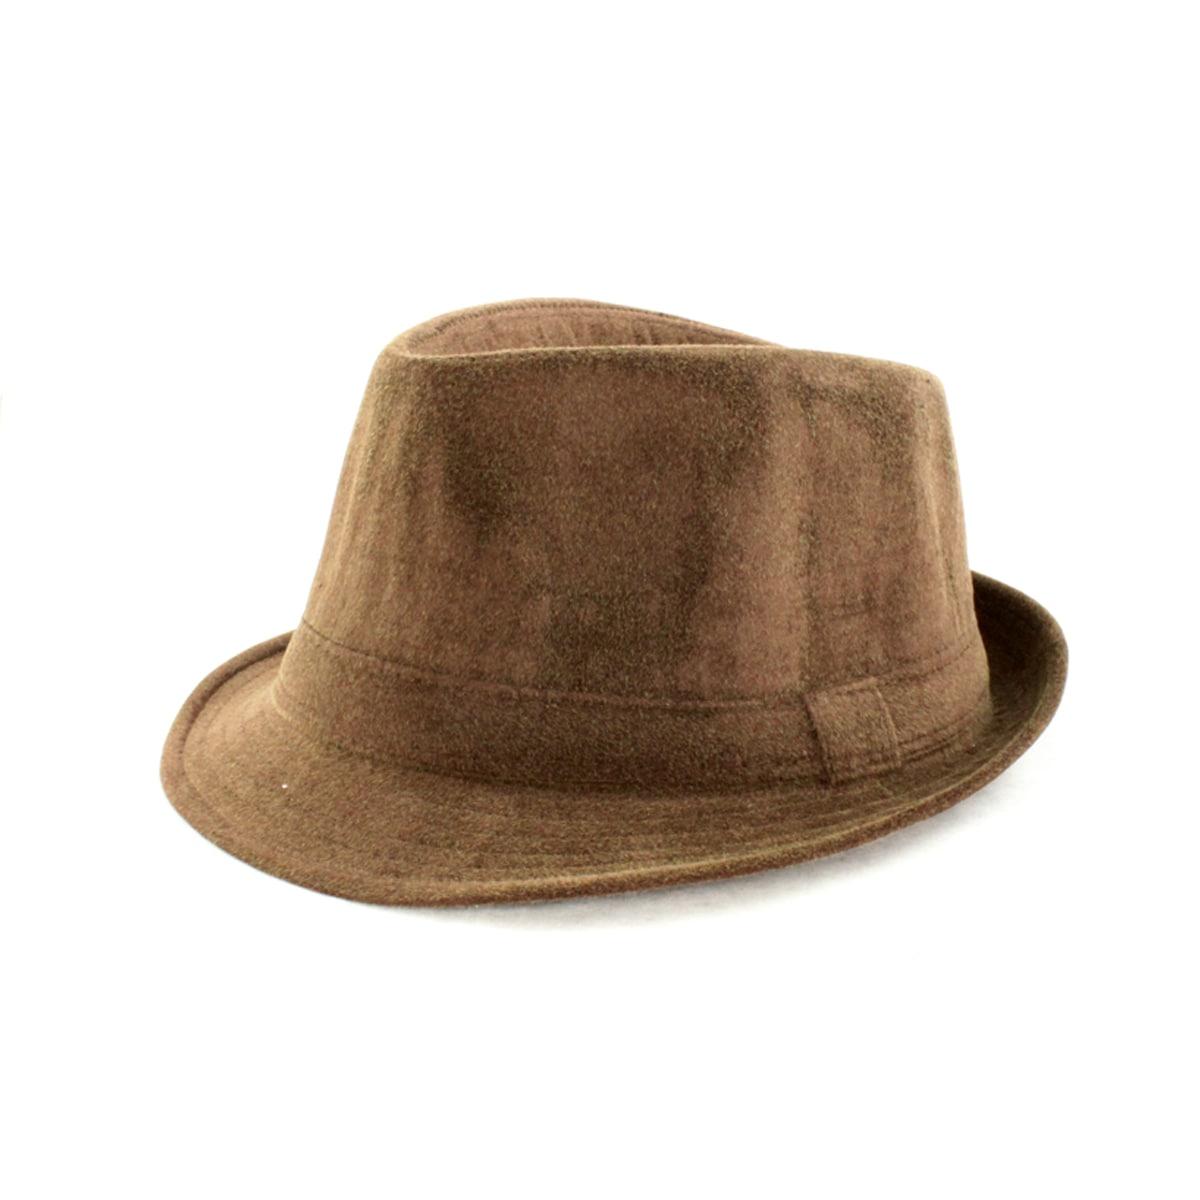 Faddism Brown Fedora Hat